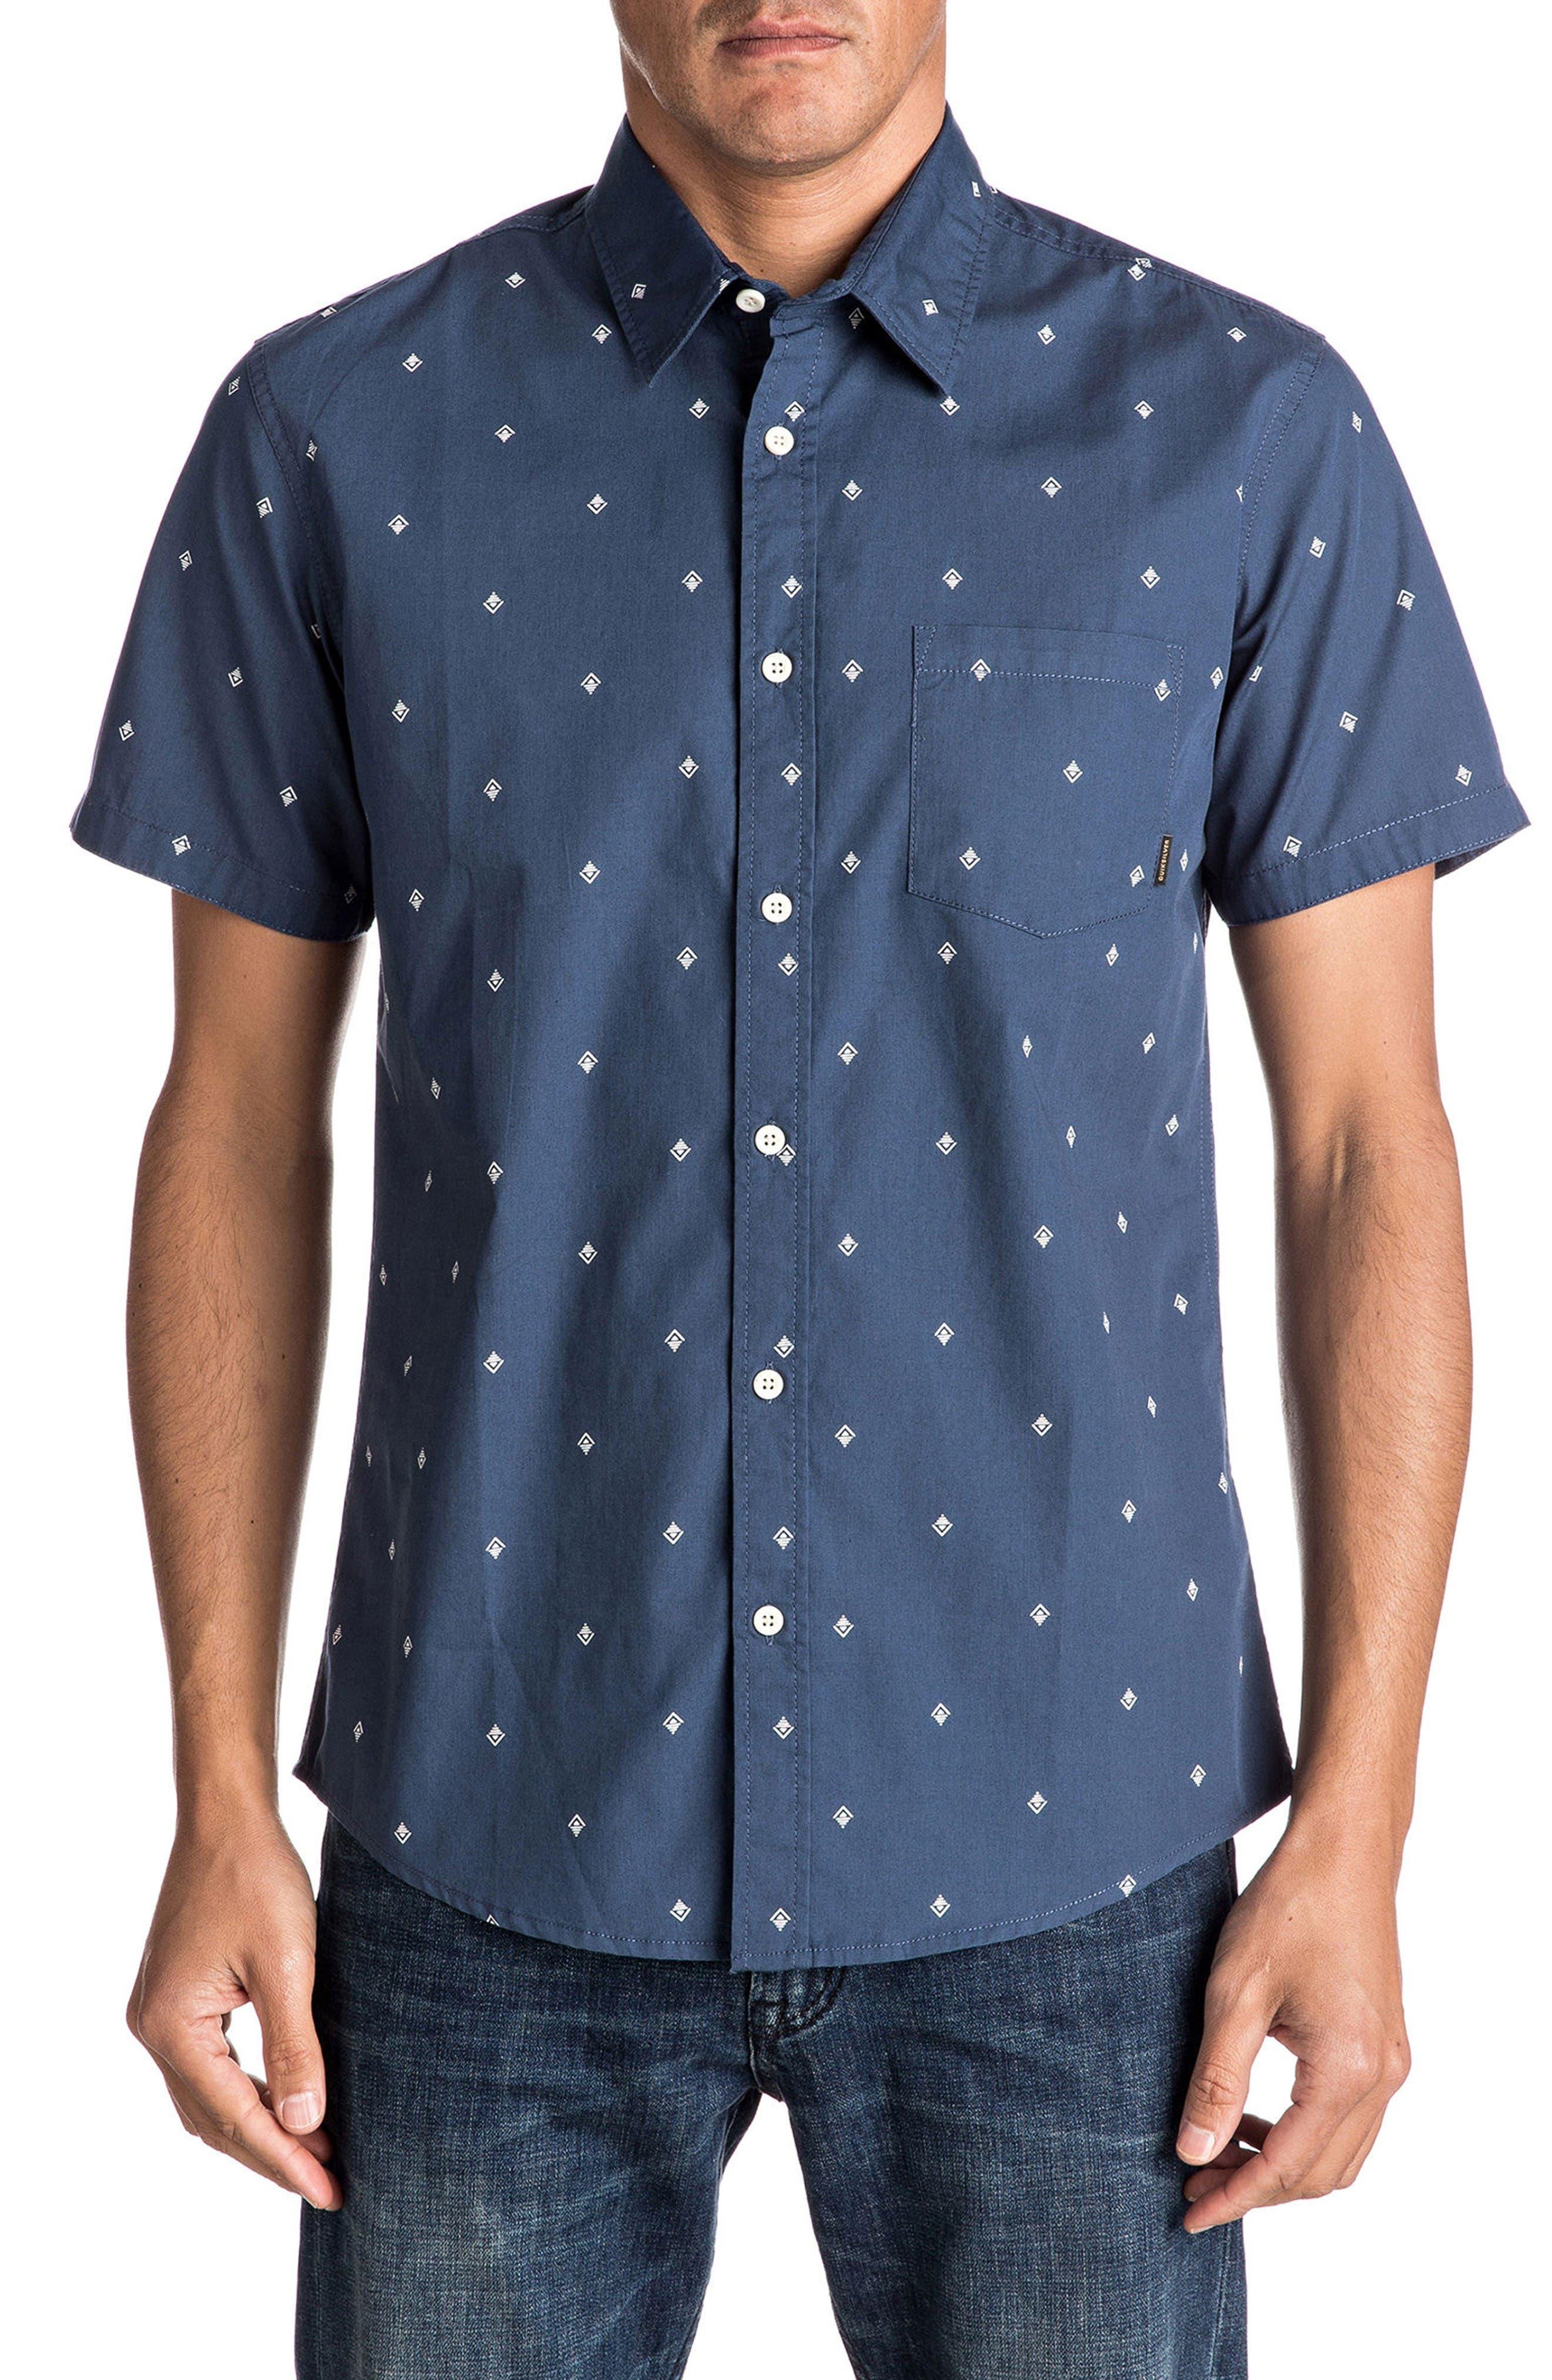 Quiksilver Everyday Mini Print Woven Shirt